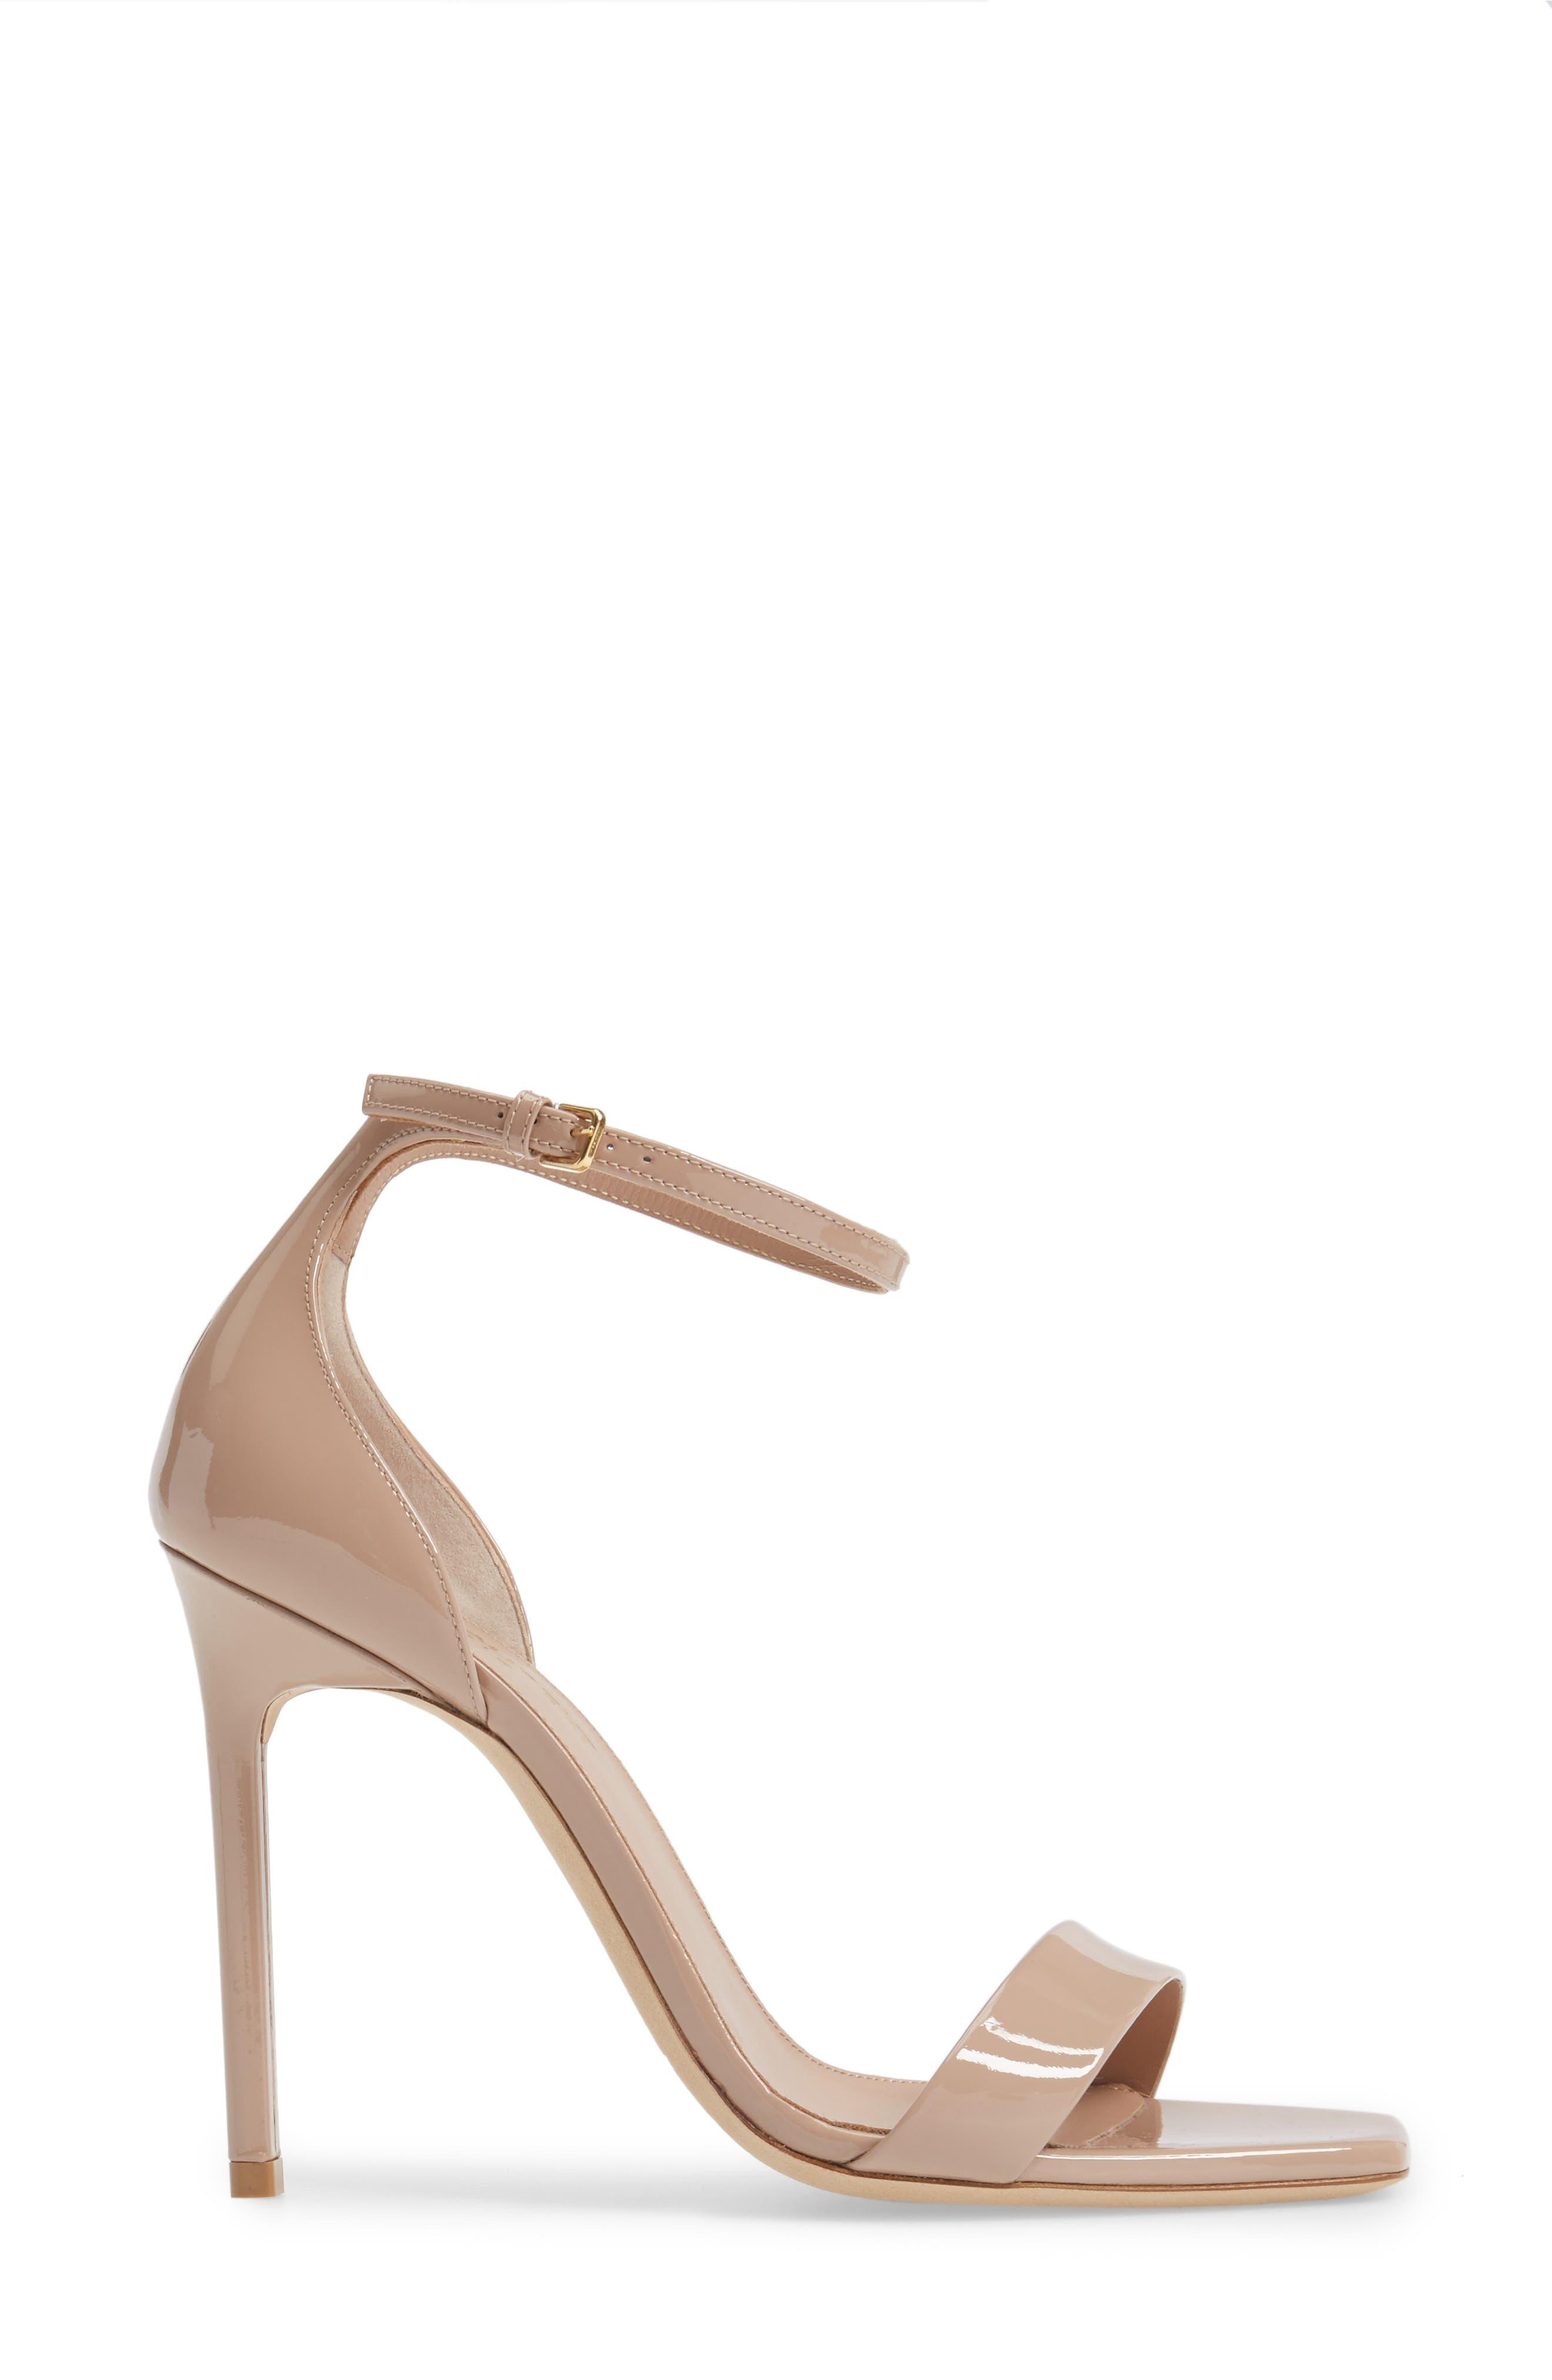 Amber Ankle Strap Sandal,                             Alternate thumbnail 3, color,                             NUDE PATENT